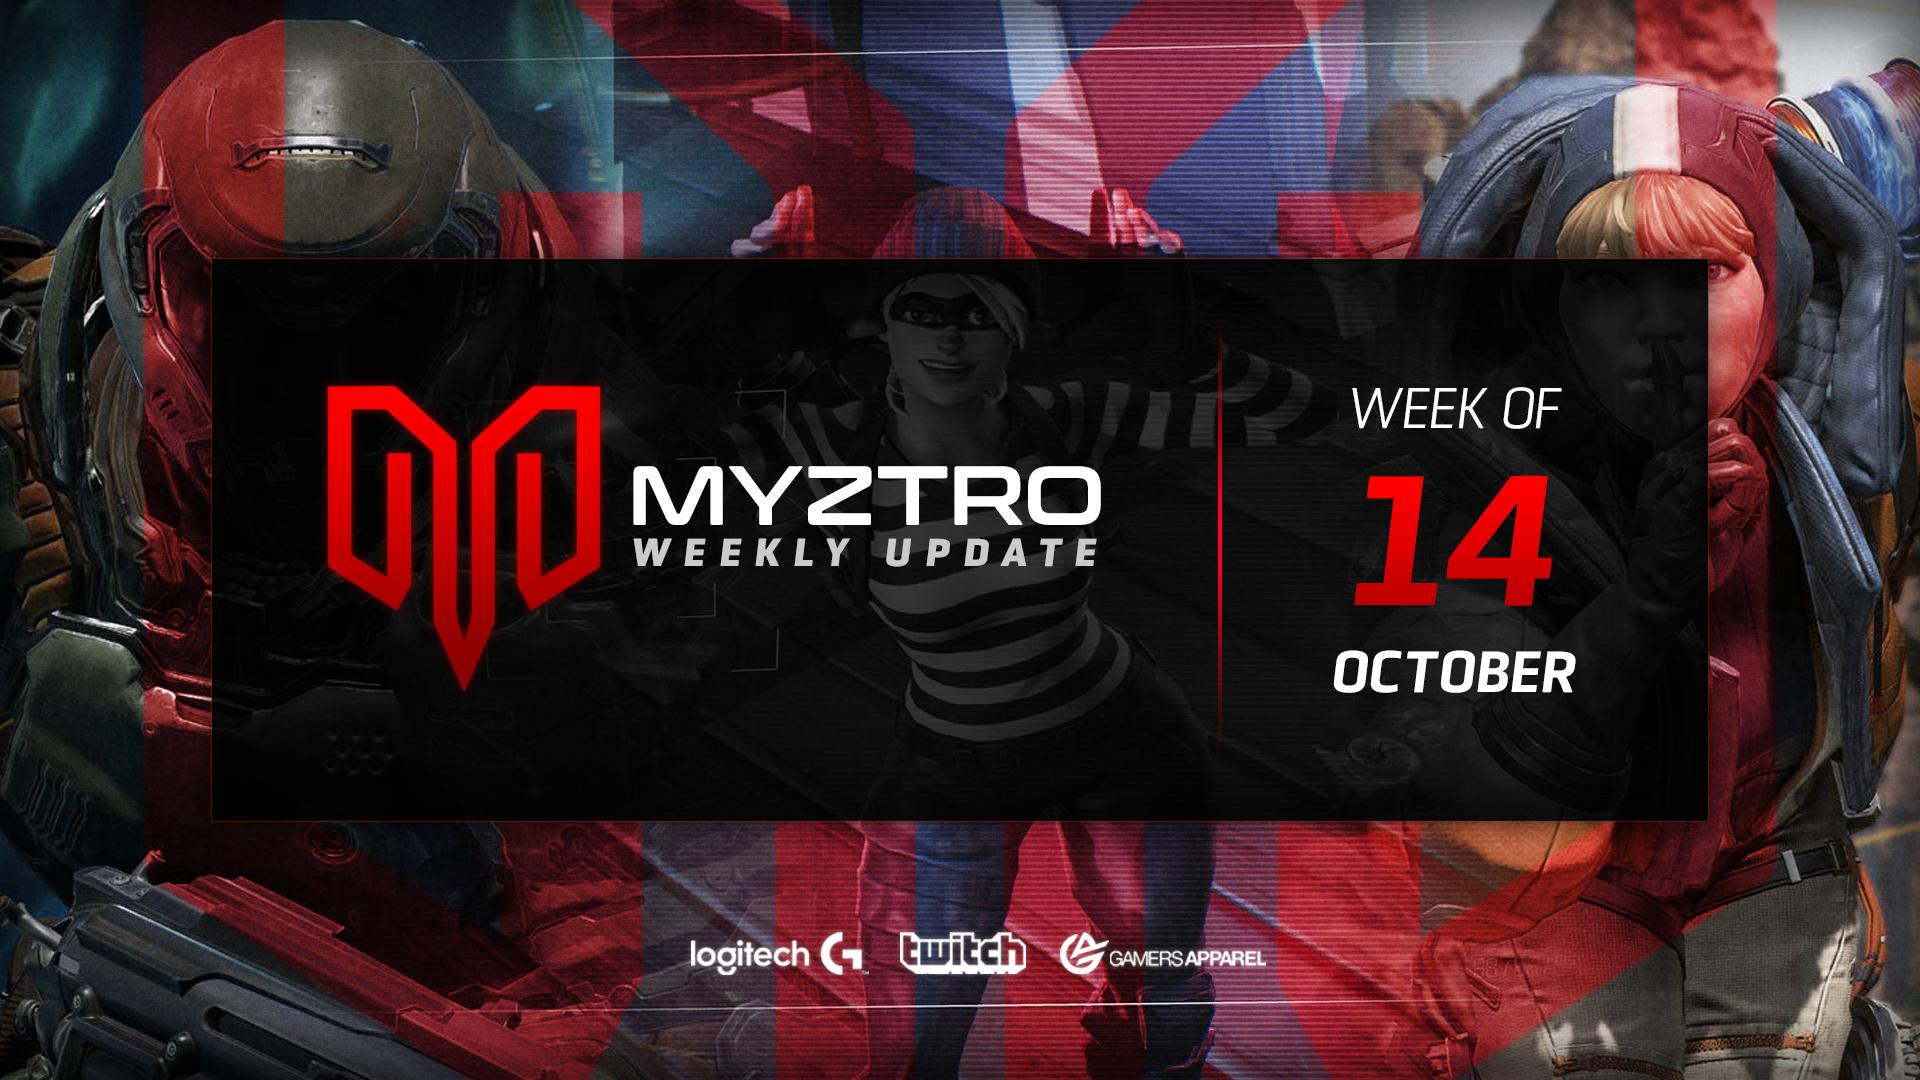 Myztro Weekly Update 2: 10/14/2019